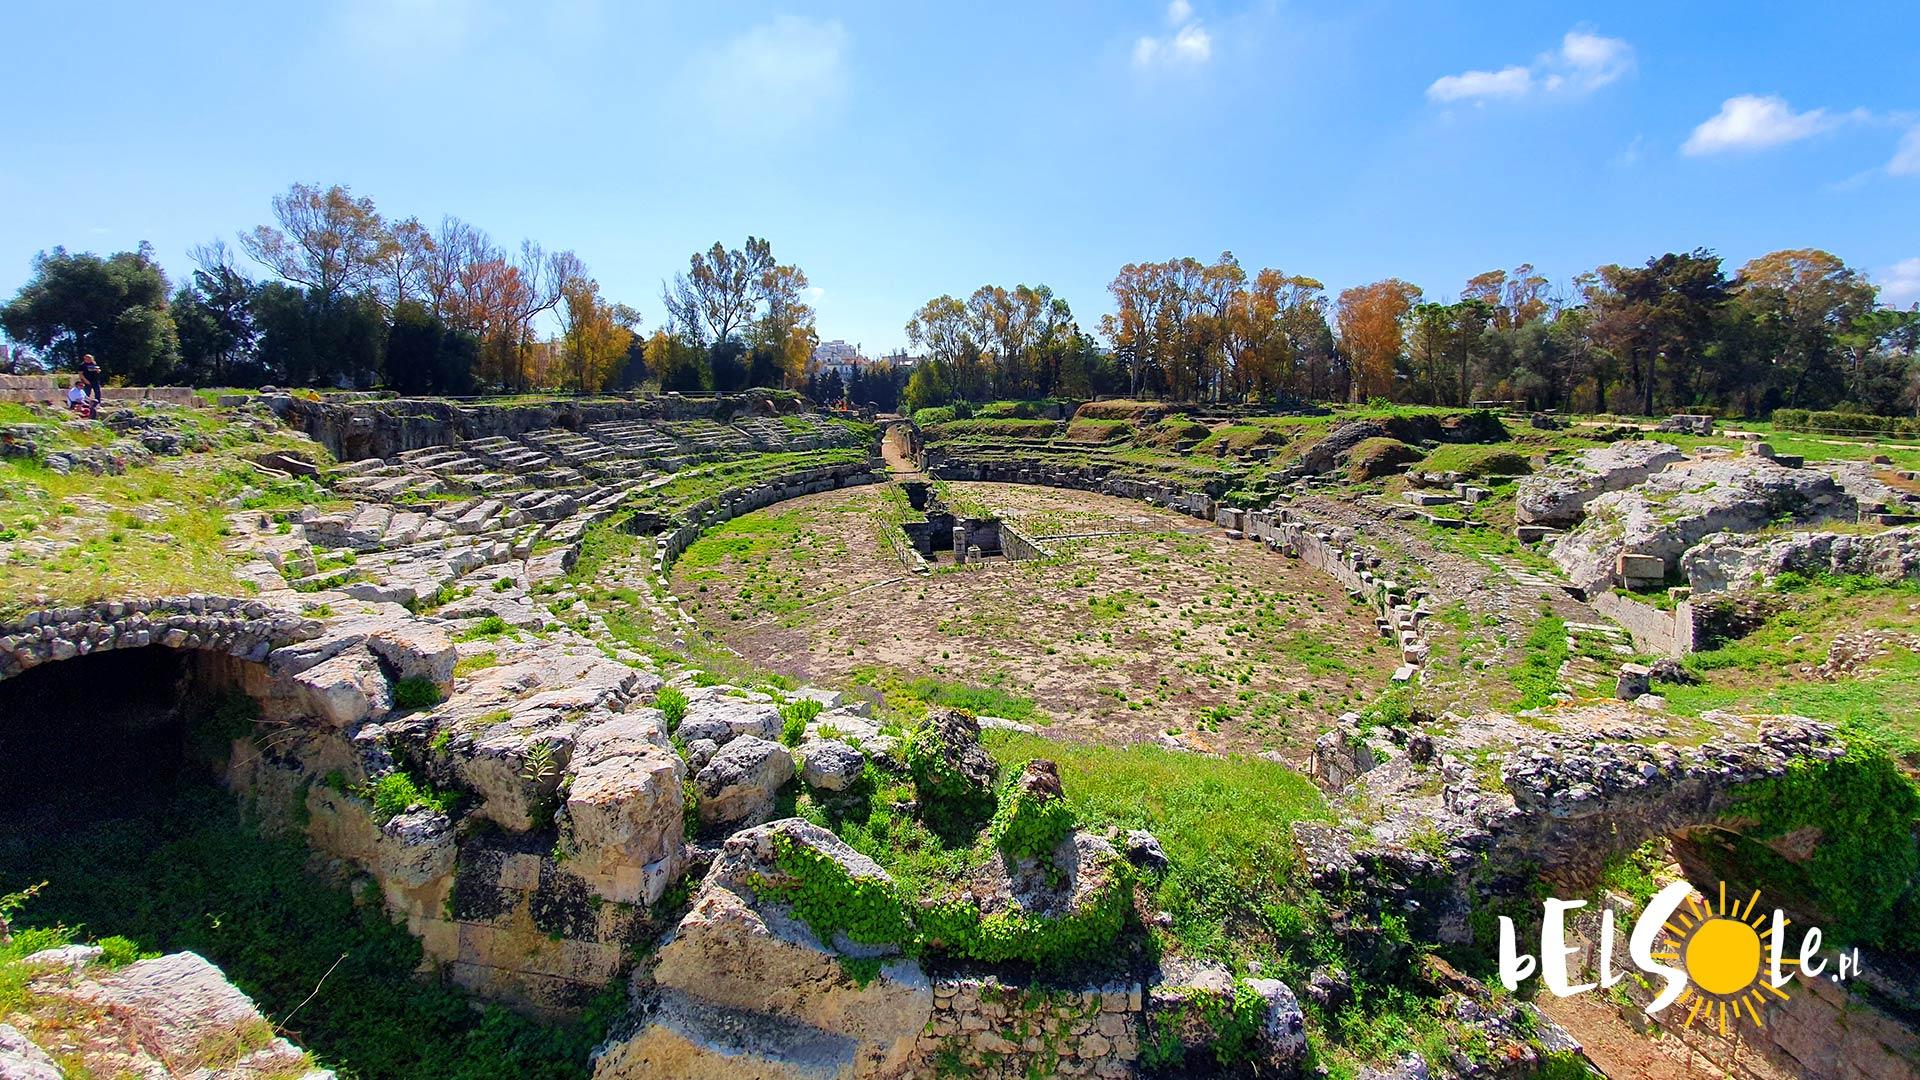 amfiteatr rzymski syrakuzy